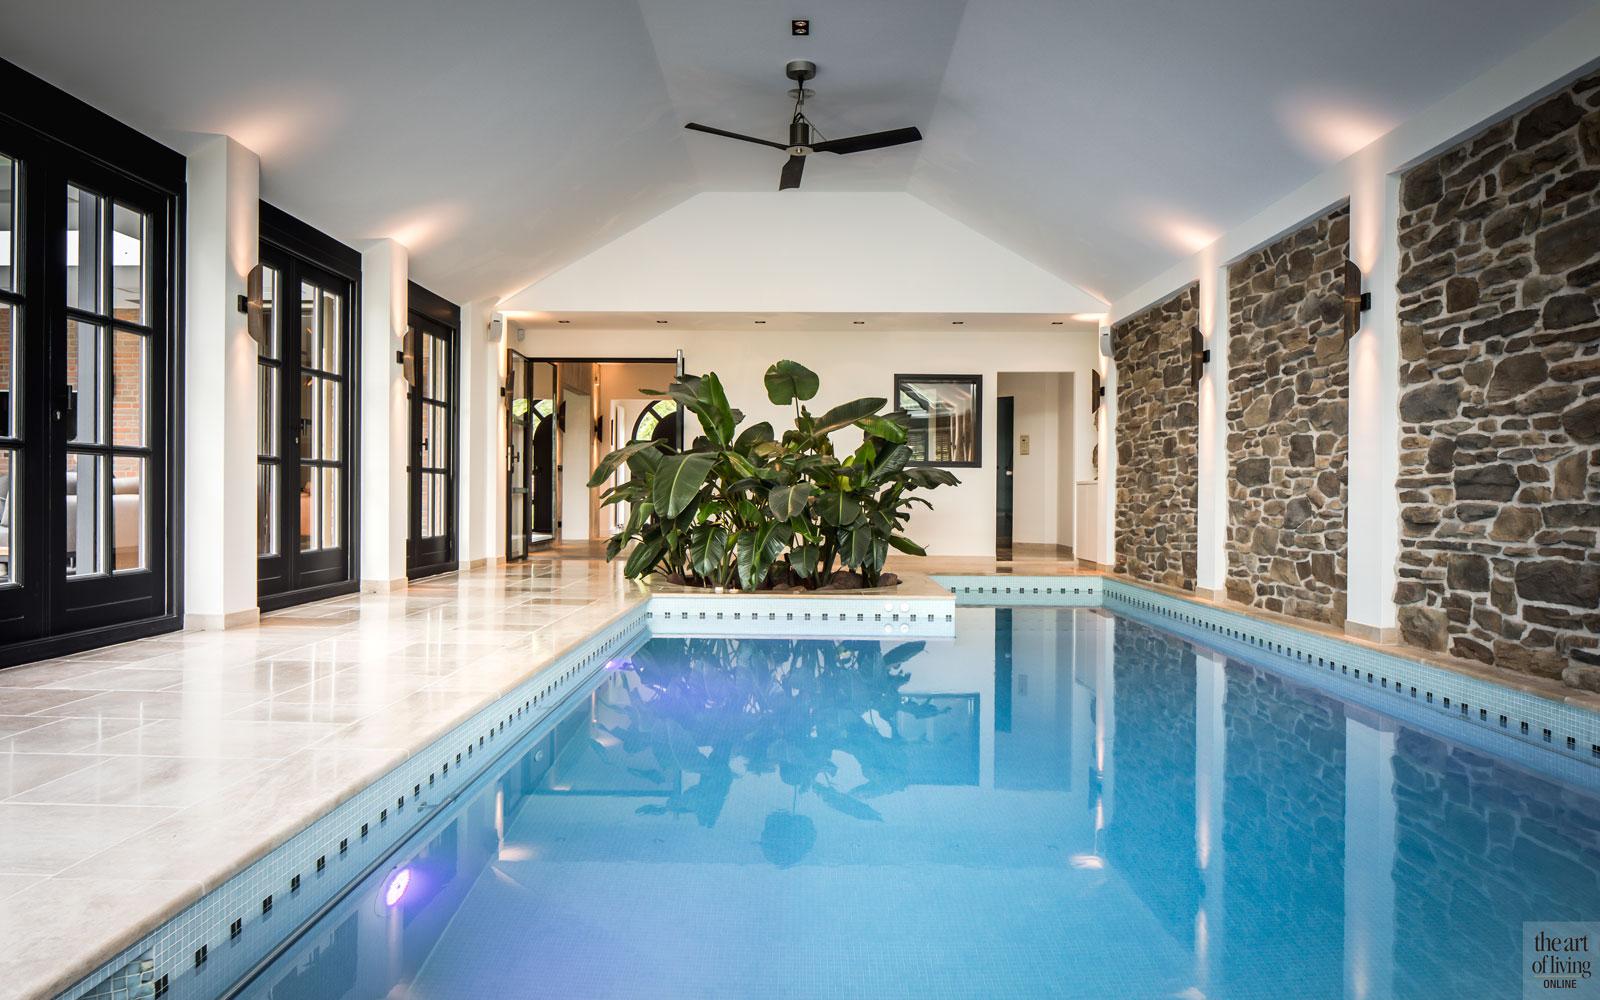 zwembaden, luxe zwembad, luxe zwembaden, luxe binnenbad, zwembad bouwen, the art of living